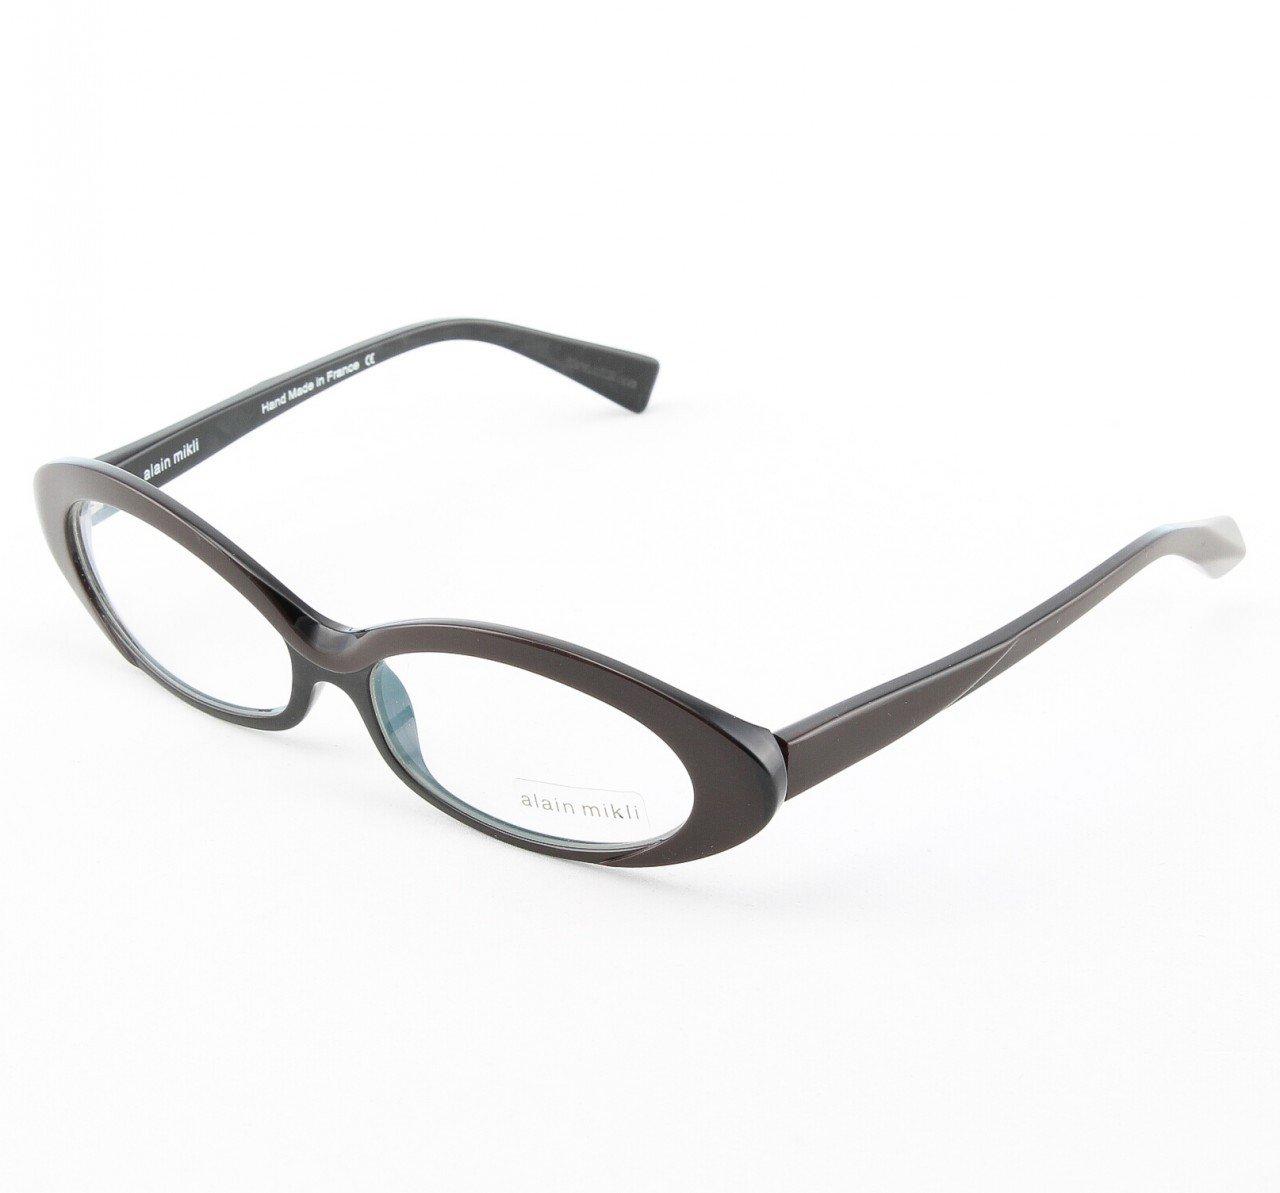 Alain Mikli Eyeglasses AL1037 Col. 2 Chocolate Brown with Black Frame Accent